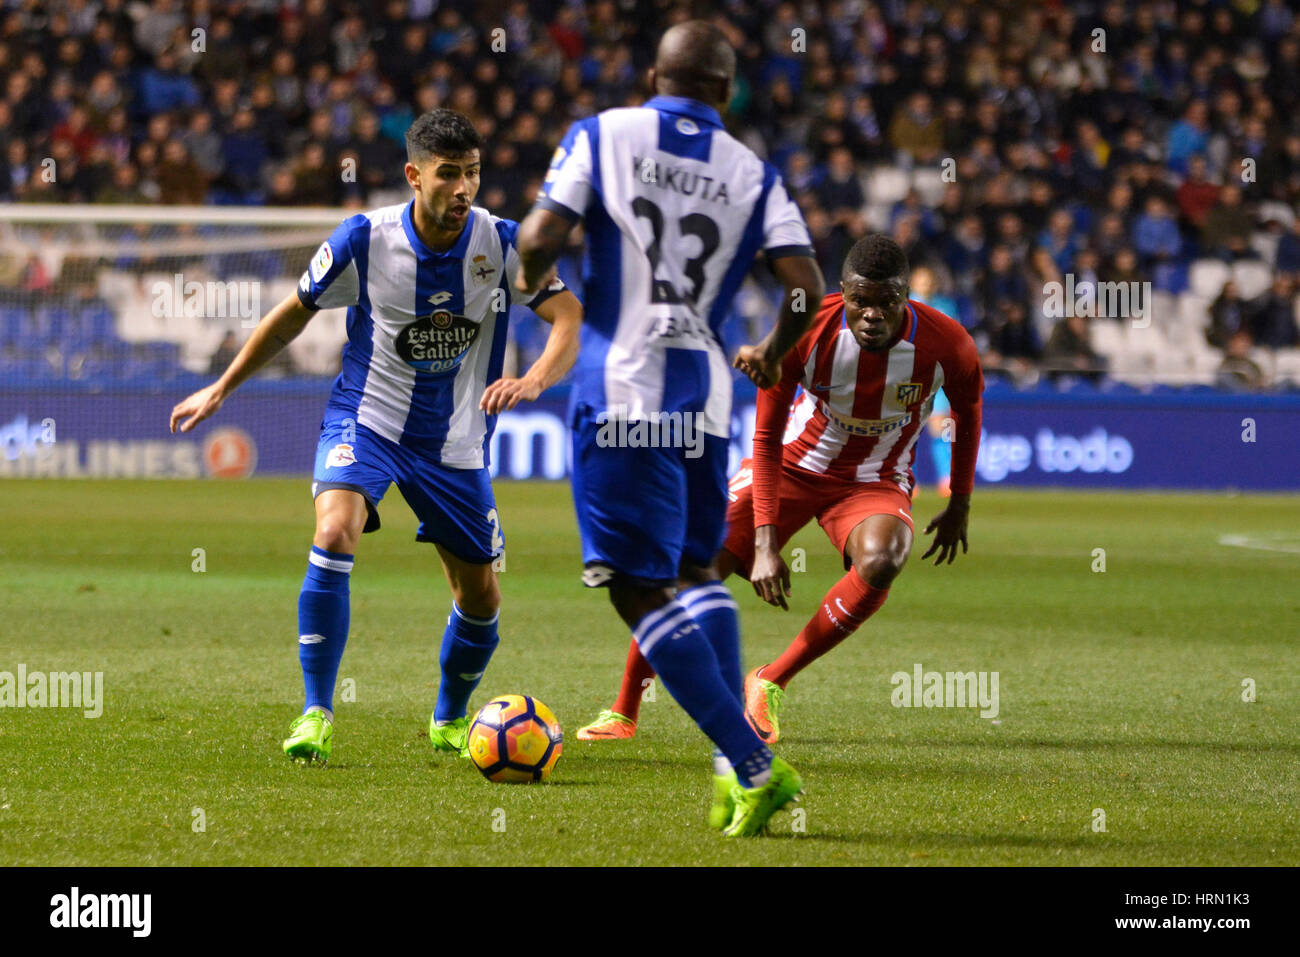 Riazor Stadium, La Coruna, Spain. 2nd March 2017. Juanfran. La Liga Santander Matchday 25. Riazor Stadium, La Coruna, - Stock Image